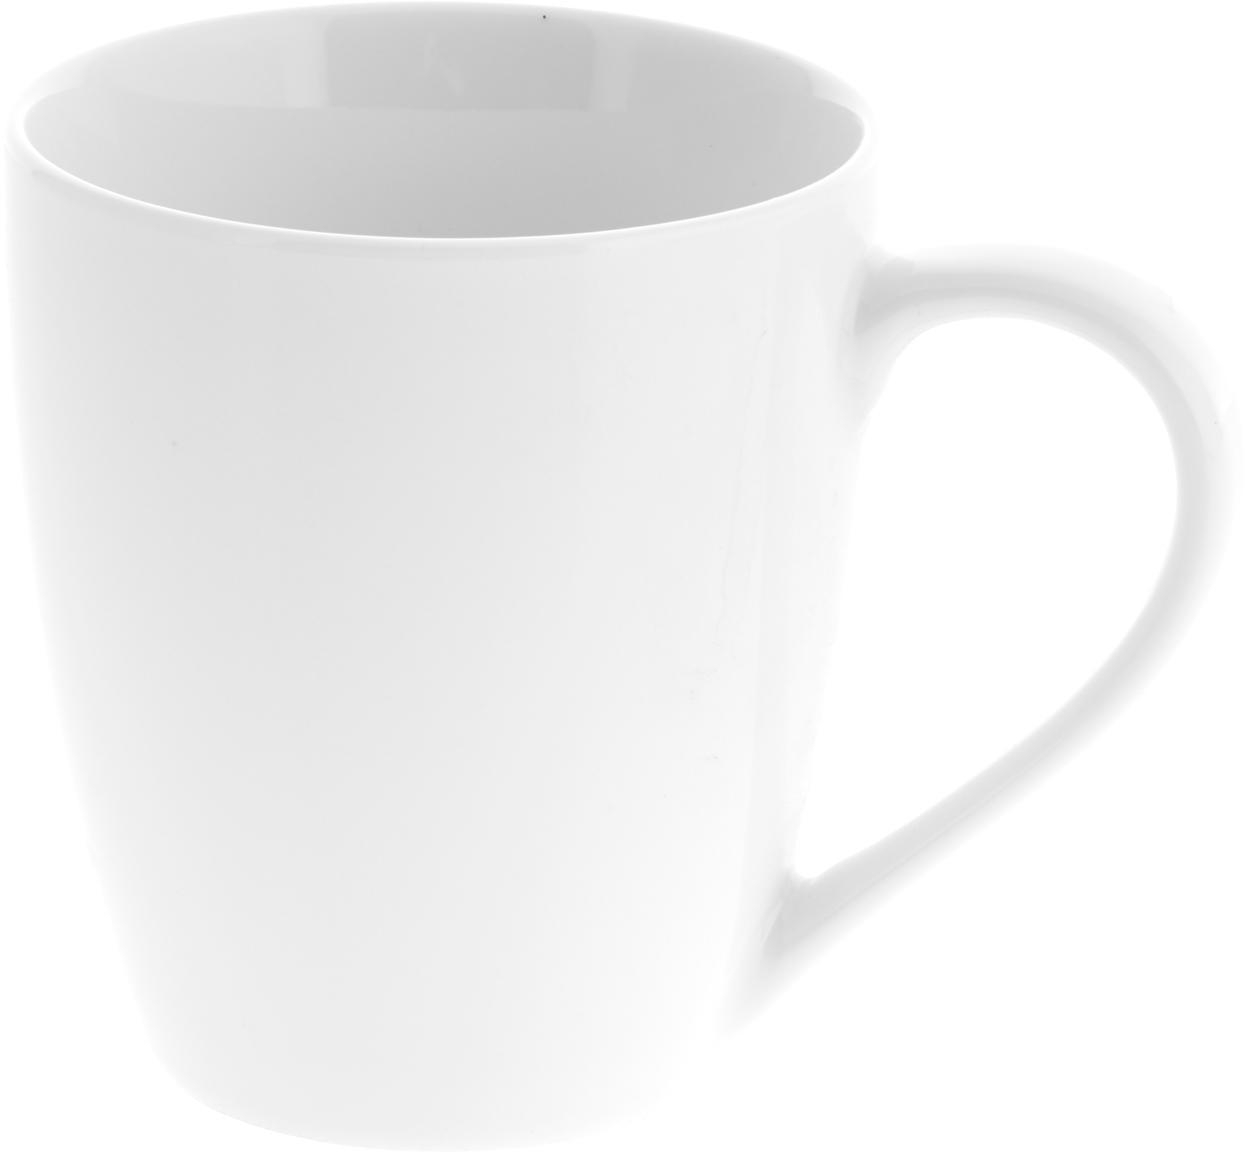 Tazas de porcelana Delight, 2uds., Porcelana, Blanco, Ø 9 x Al 10 cm